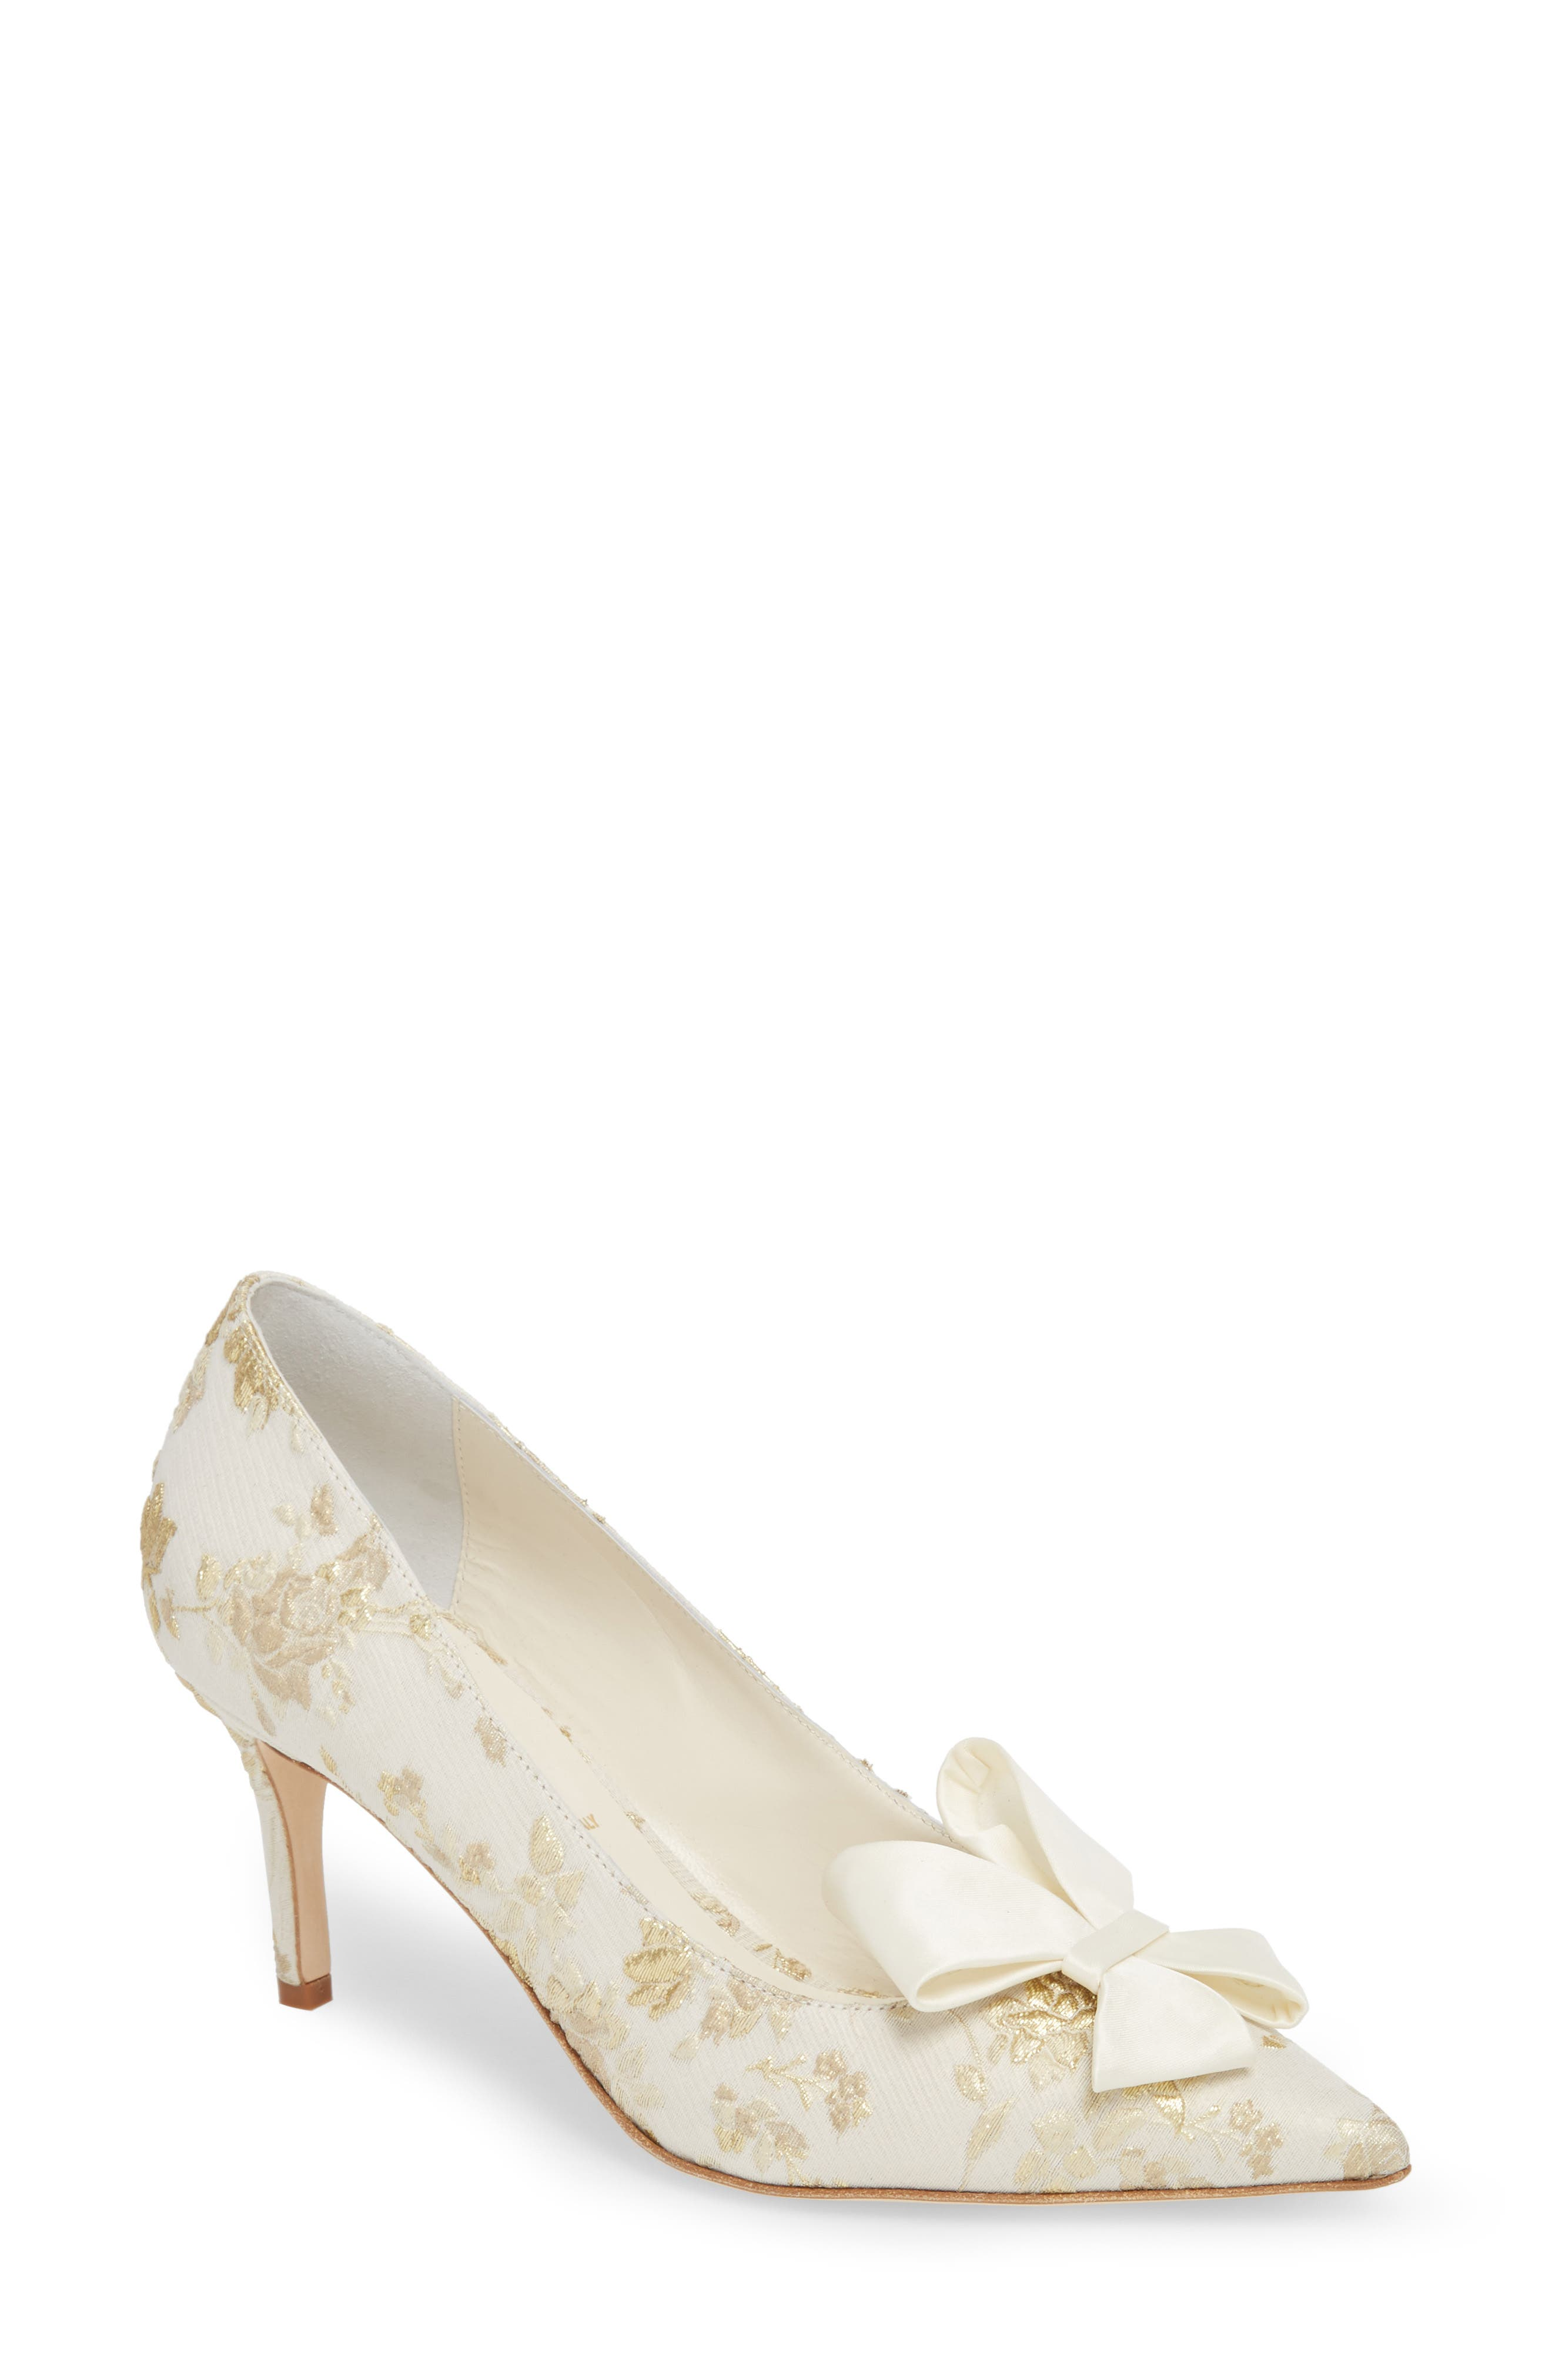 122f7d73aa Women's Something Bleu Shoes | Nordstrom